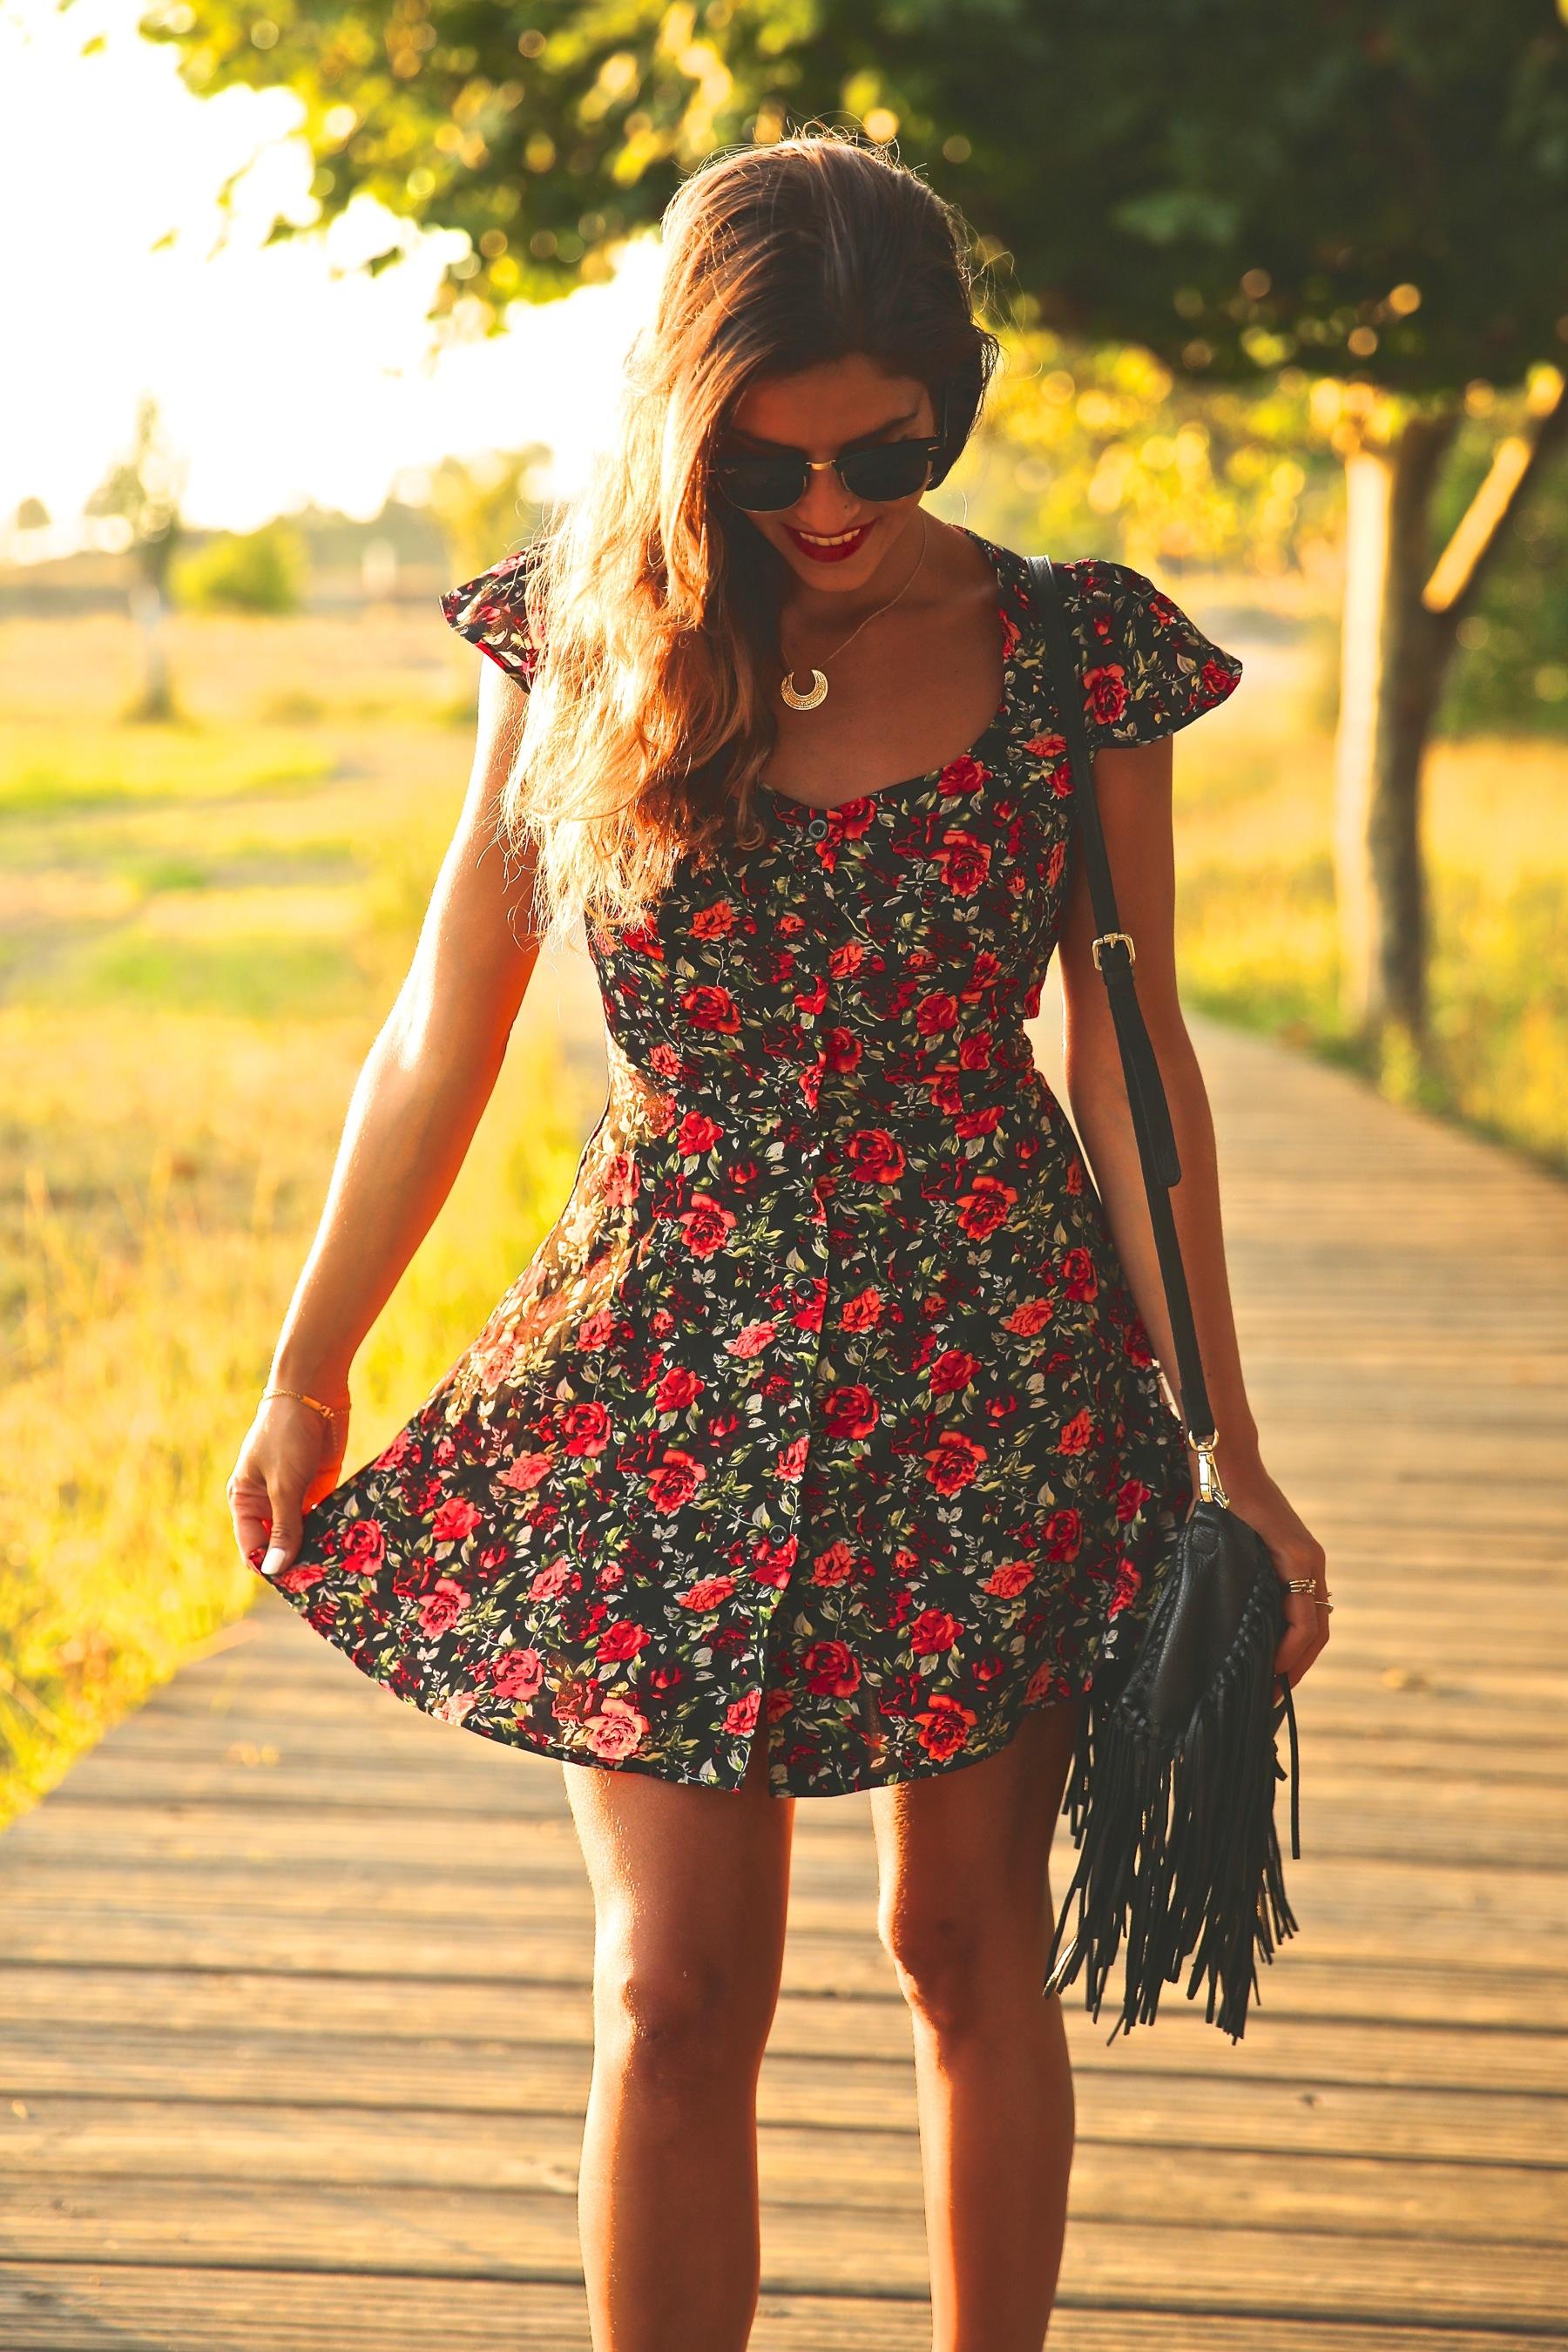 trendy_taste-look-outfit-street_style-ootd-blog-blogger-fashion_spain-moda_españa-flower_print-dress-vestido-flores-sandalias_negras-black_sandals-platforms-sunset-playa-beach-summer-7